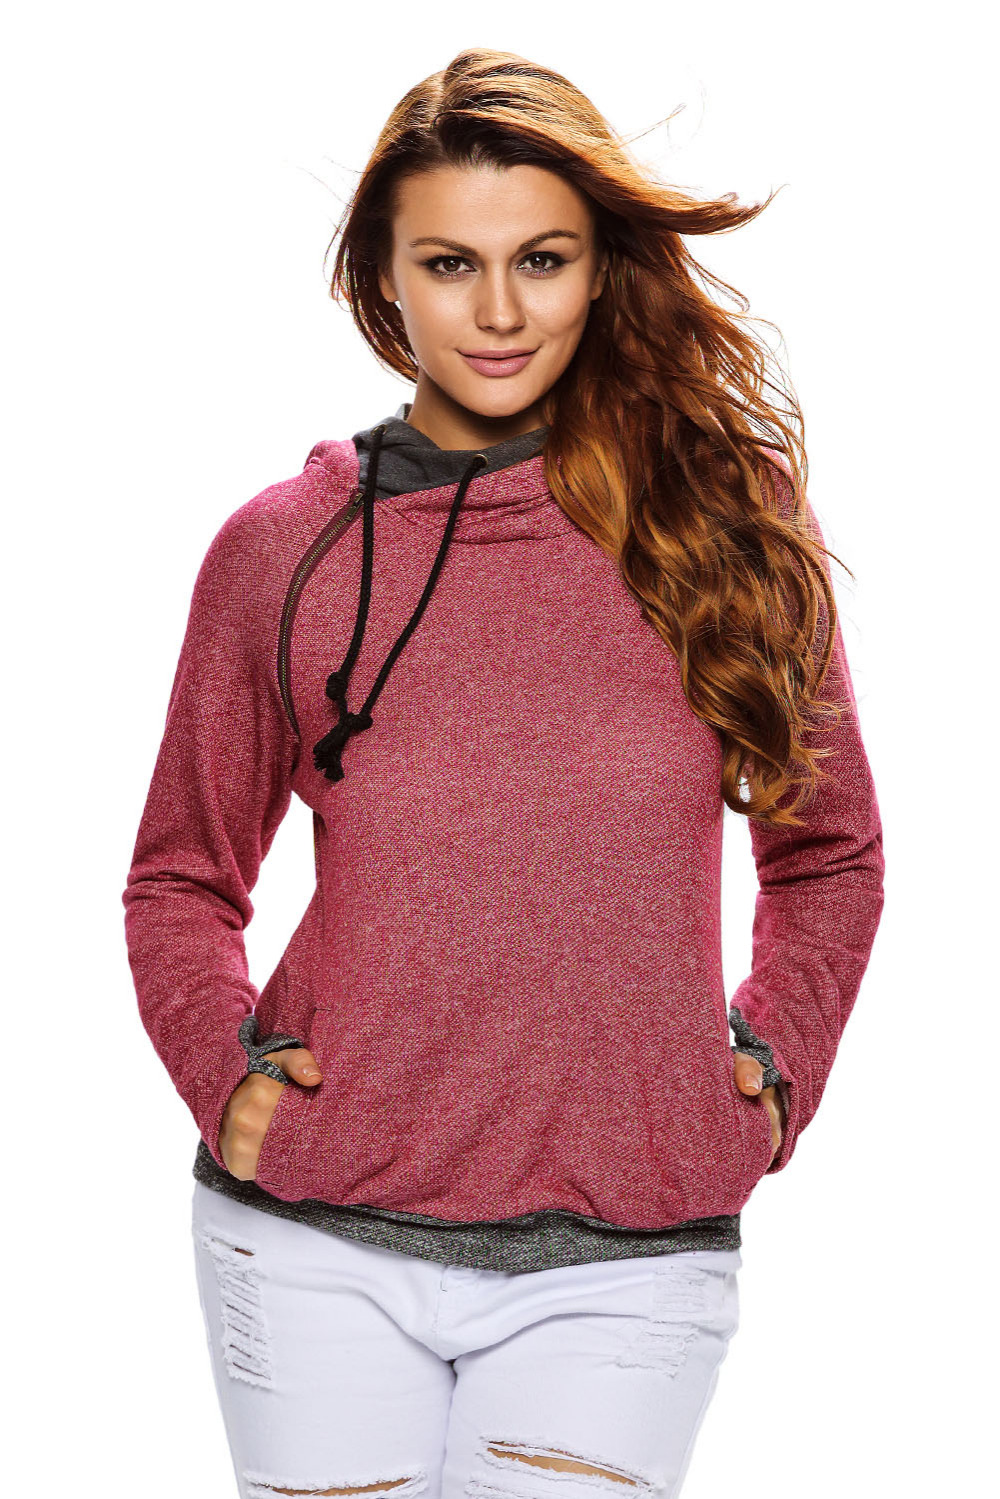 Autumn Sweatshirt new arrival double layer hooded set long-sleeve pullover Fleece Warm Moleton Feminino Coat Camisolas 2593